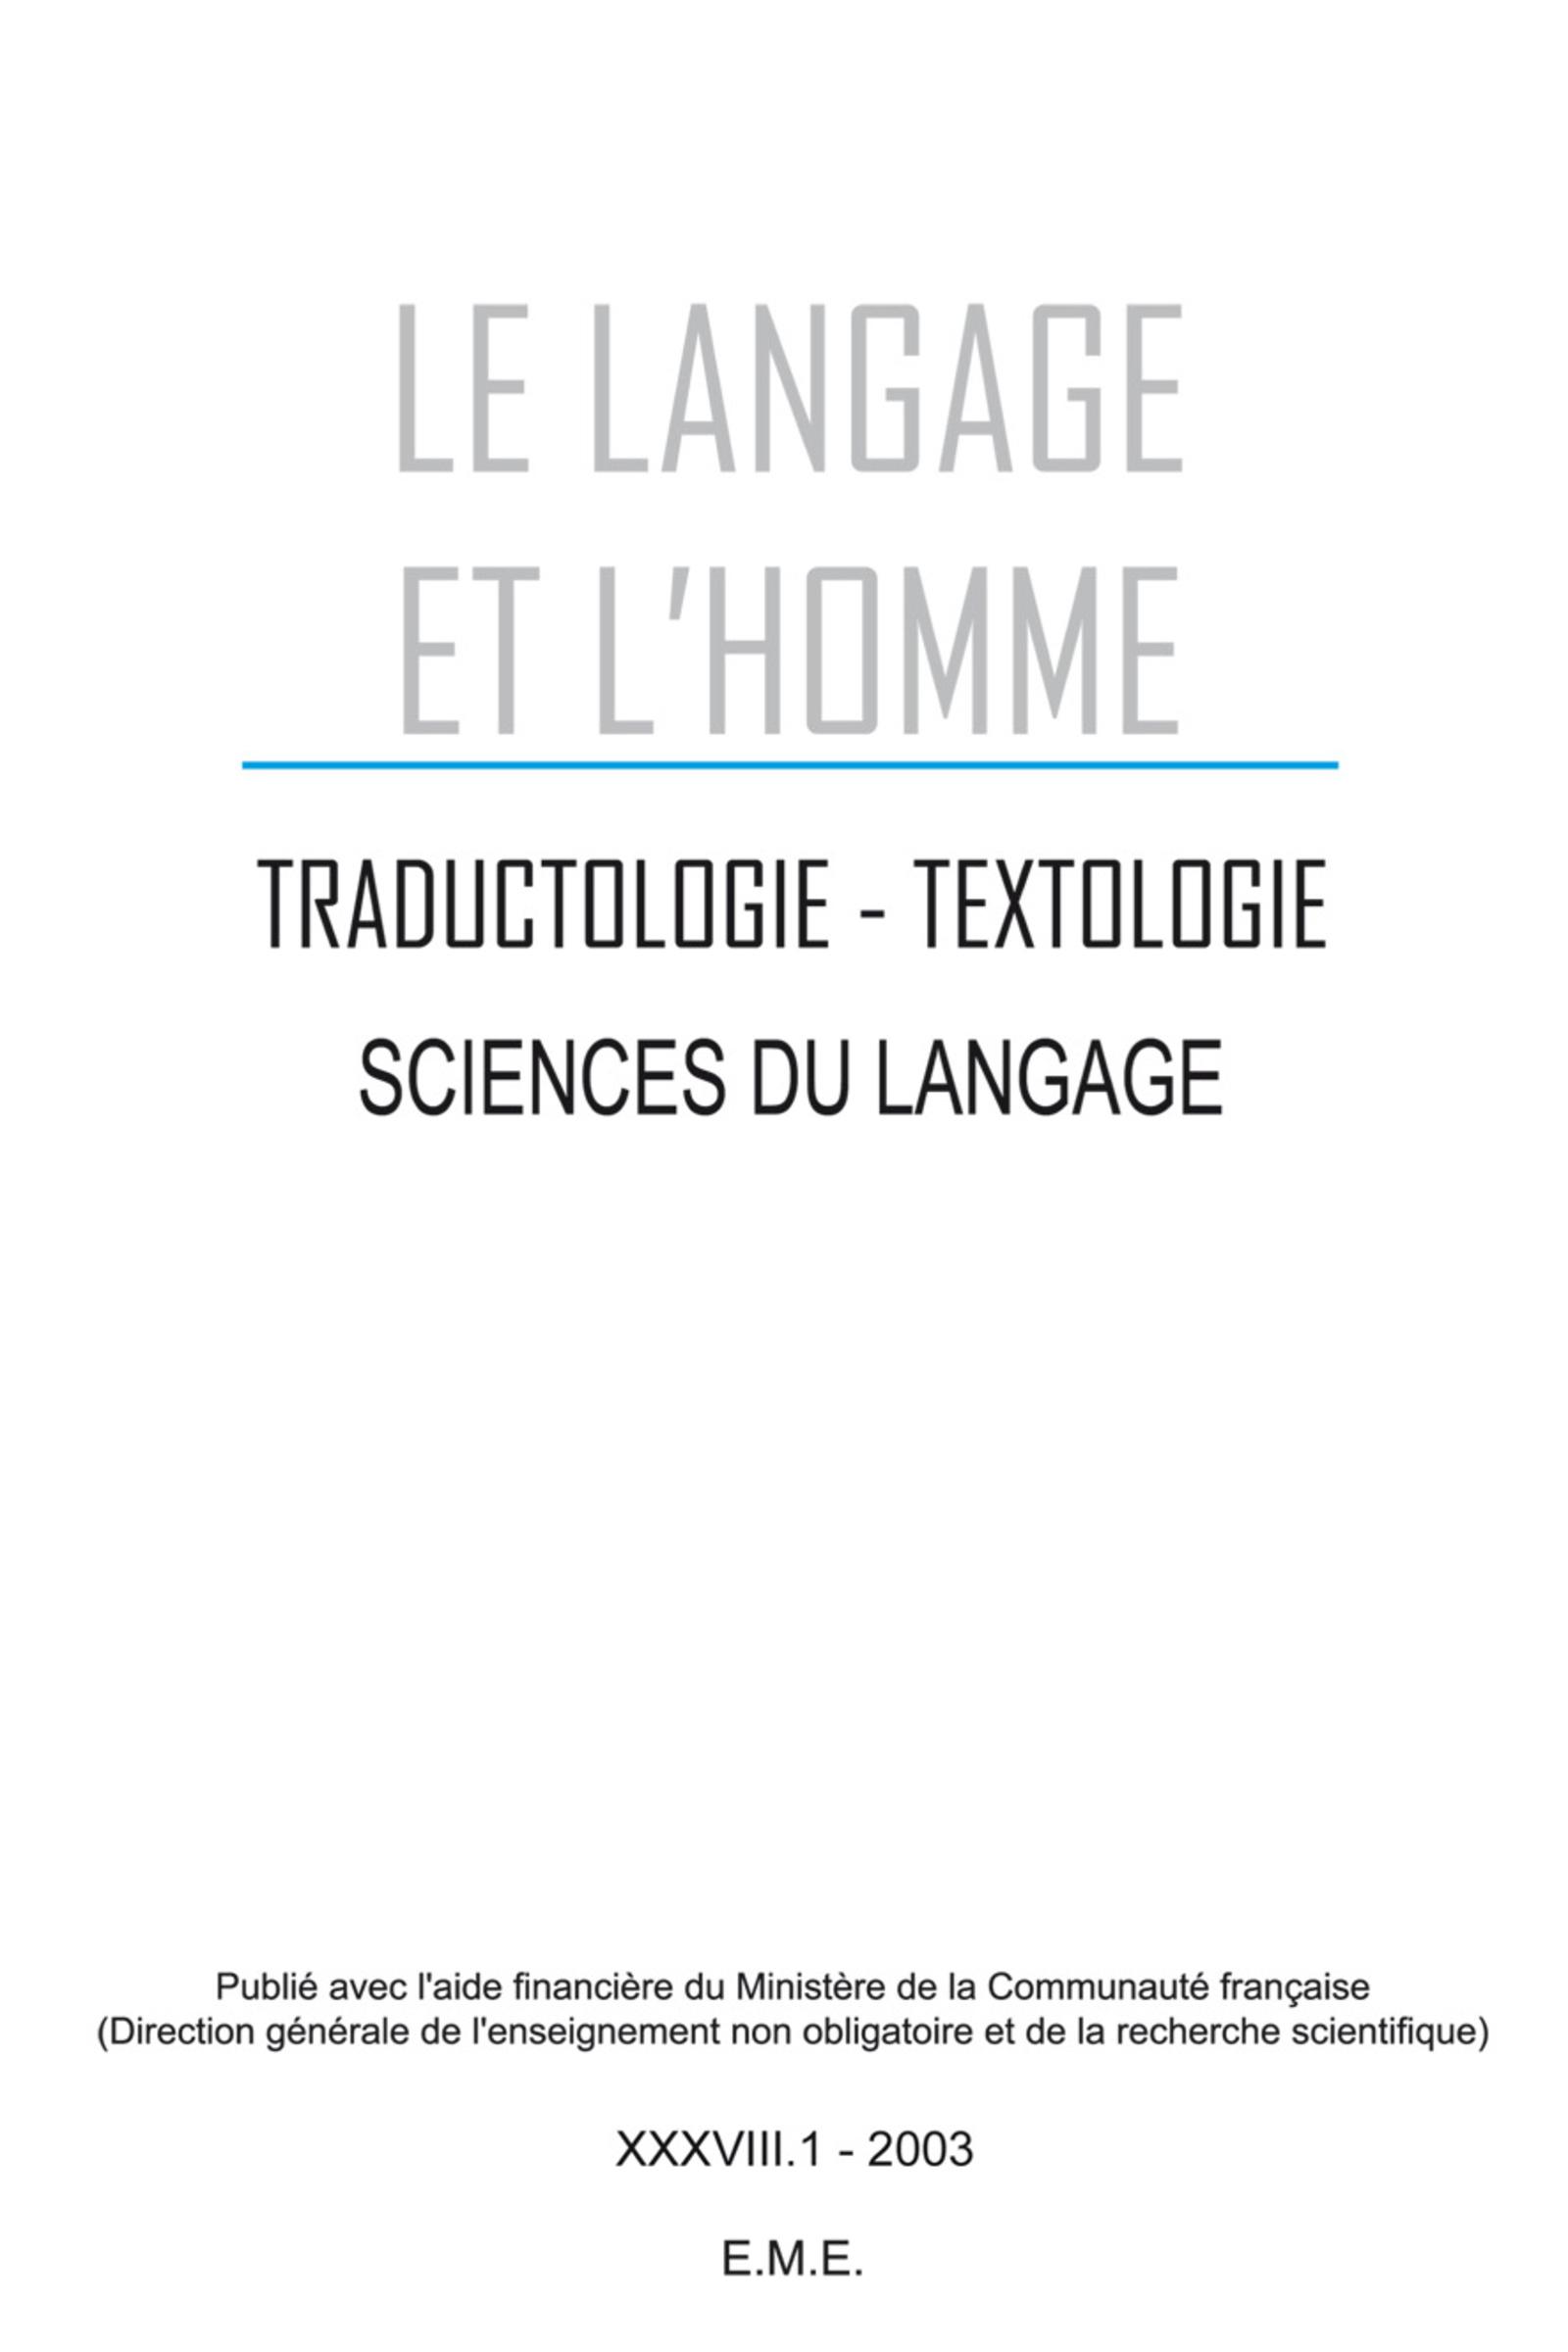 Traductologie,